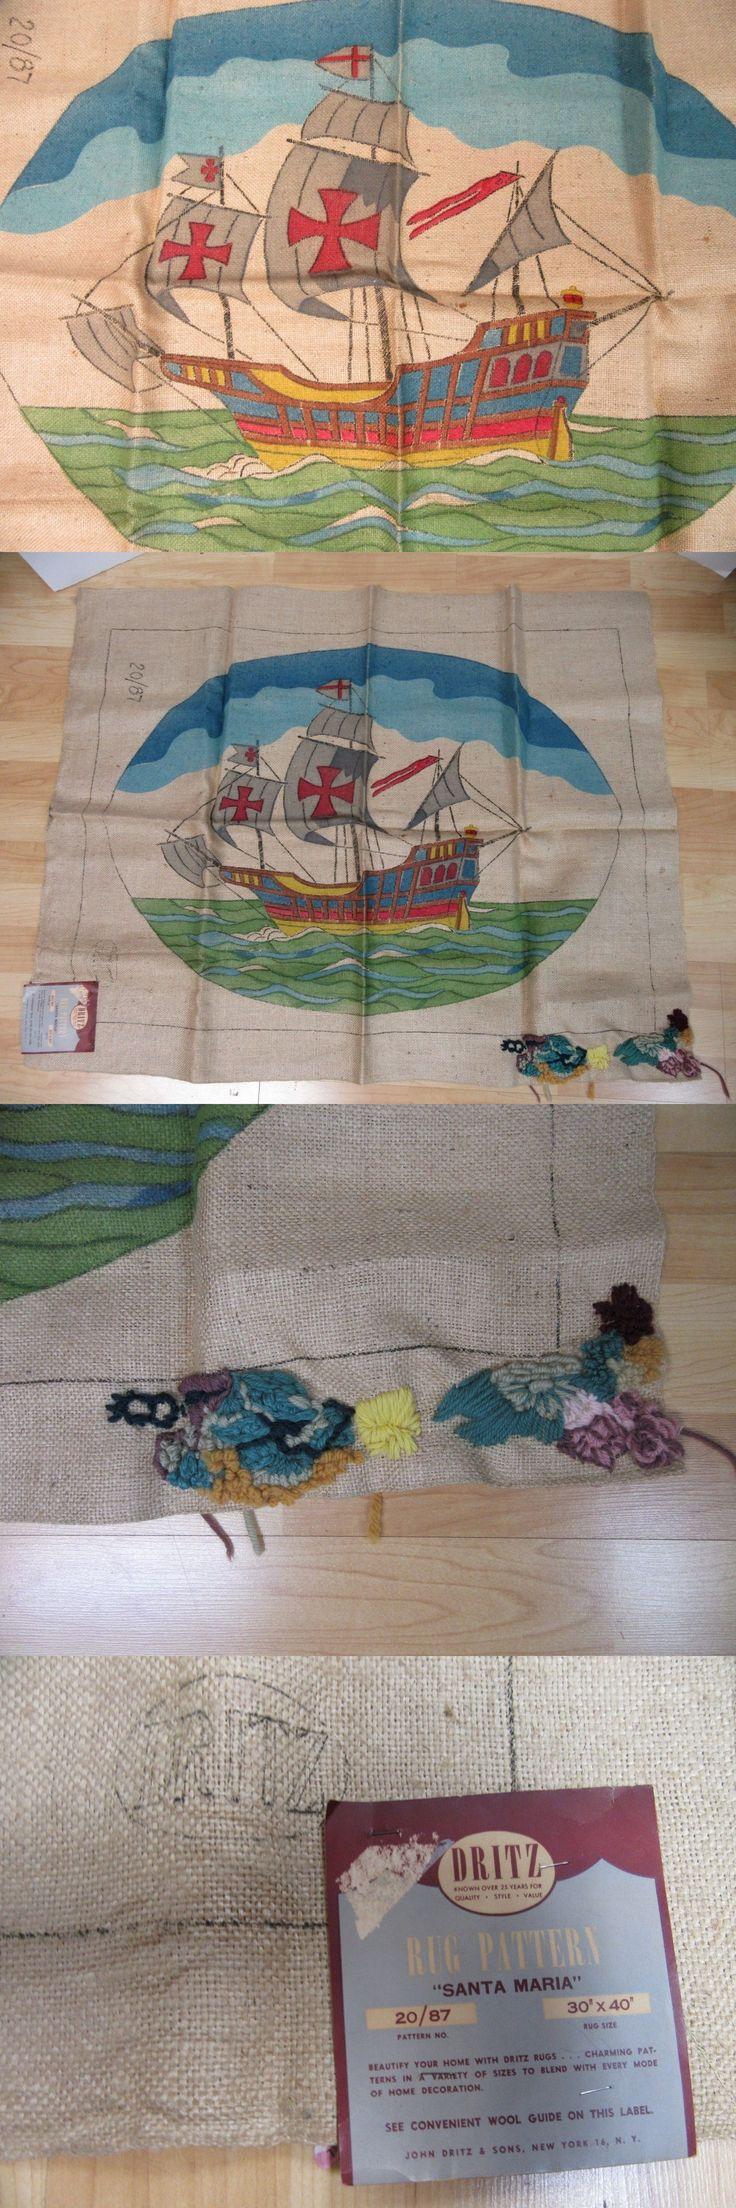 Primitive Hooking Patterns 157031: Dritz Burlap Rug Pattern 20 87 Santa Maria Sailing Ship 30X40 -> BUY IT NOW ONLY: $44.99 on eBay!